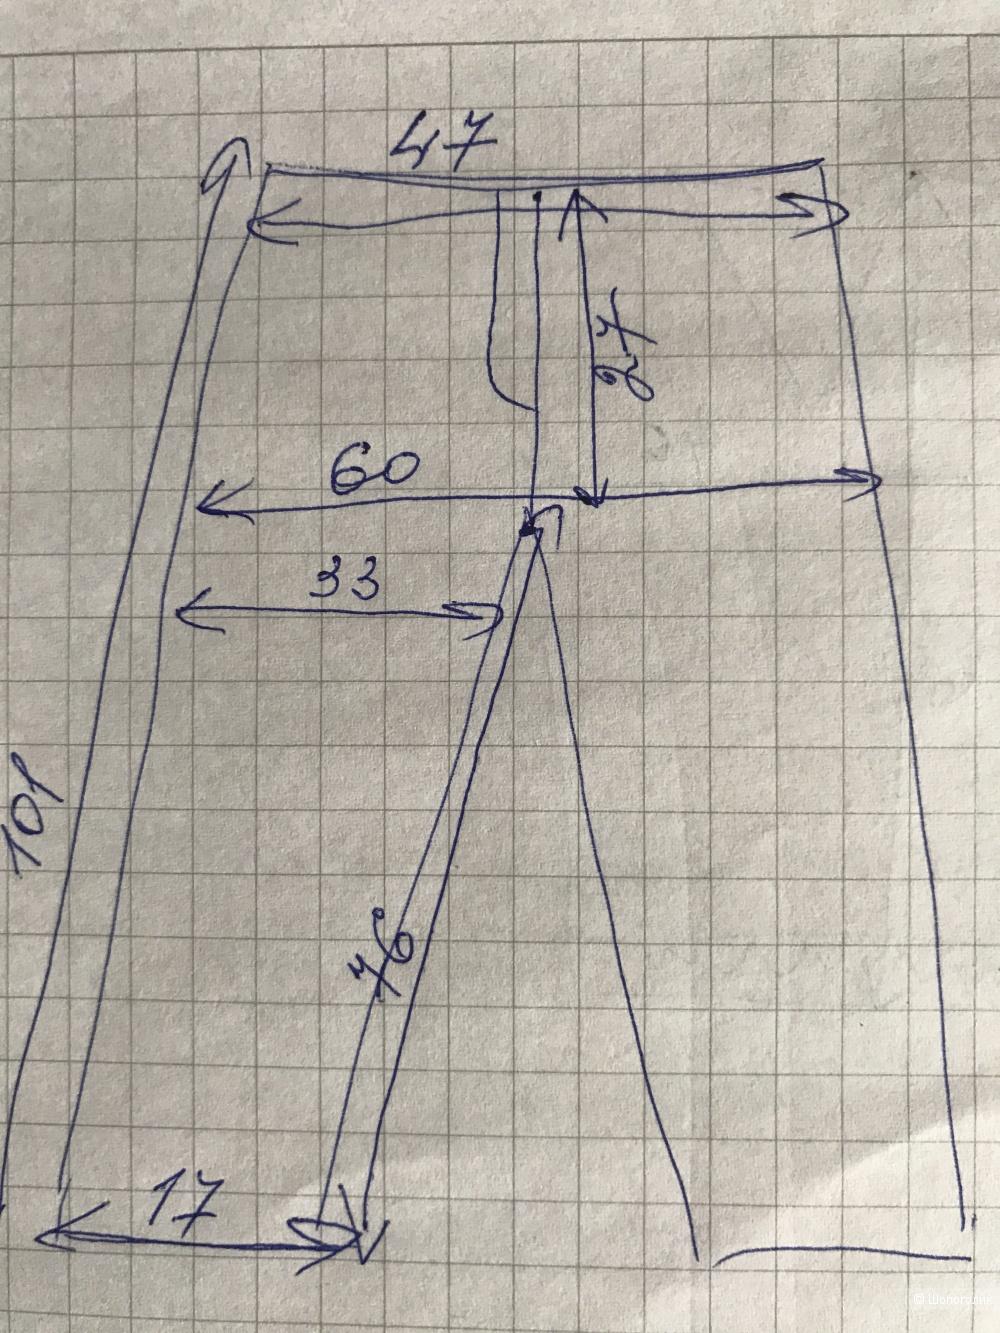 Брюки мужские DESICA DESIDERIO CAMPANO на 50-52 размер